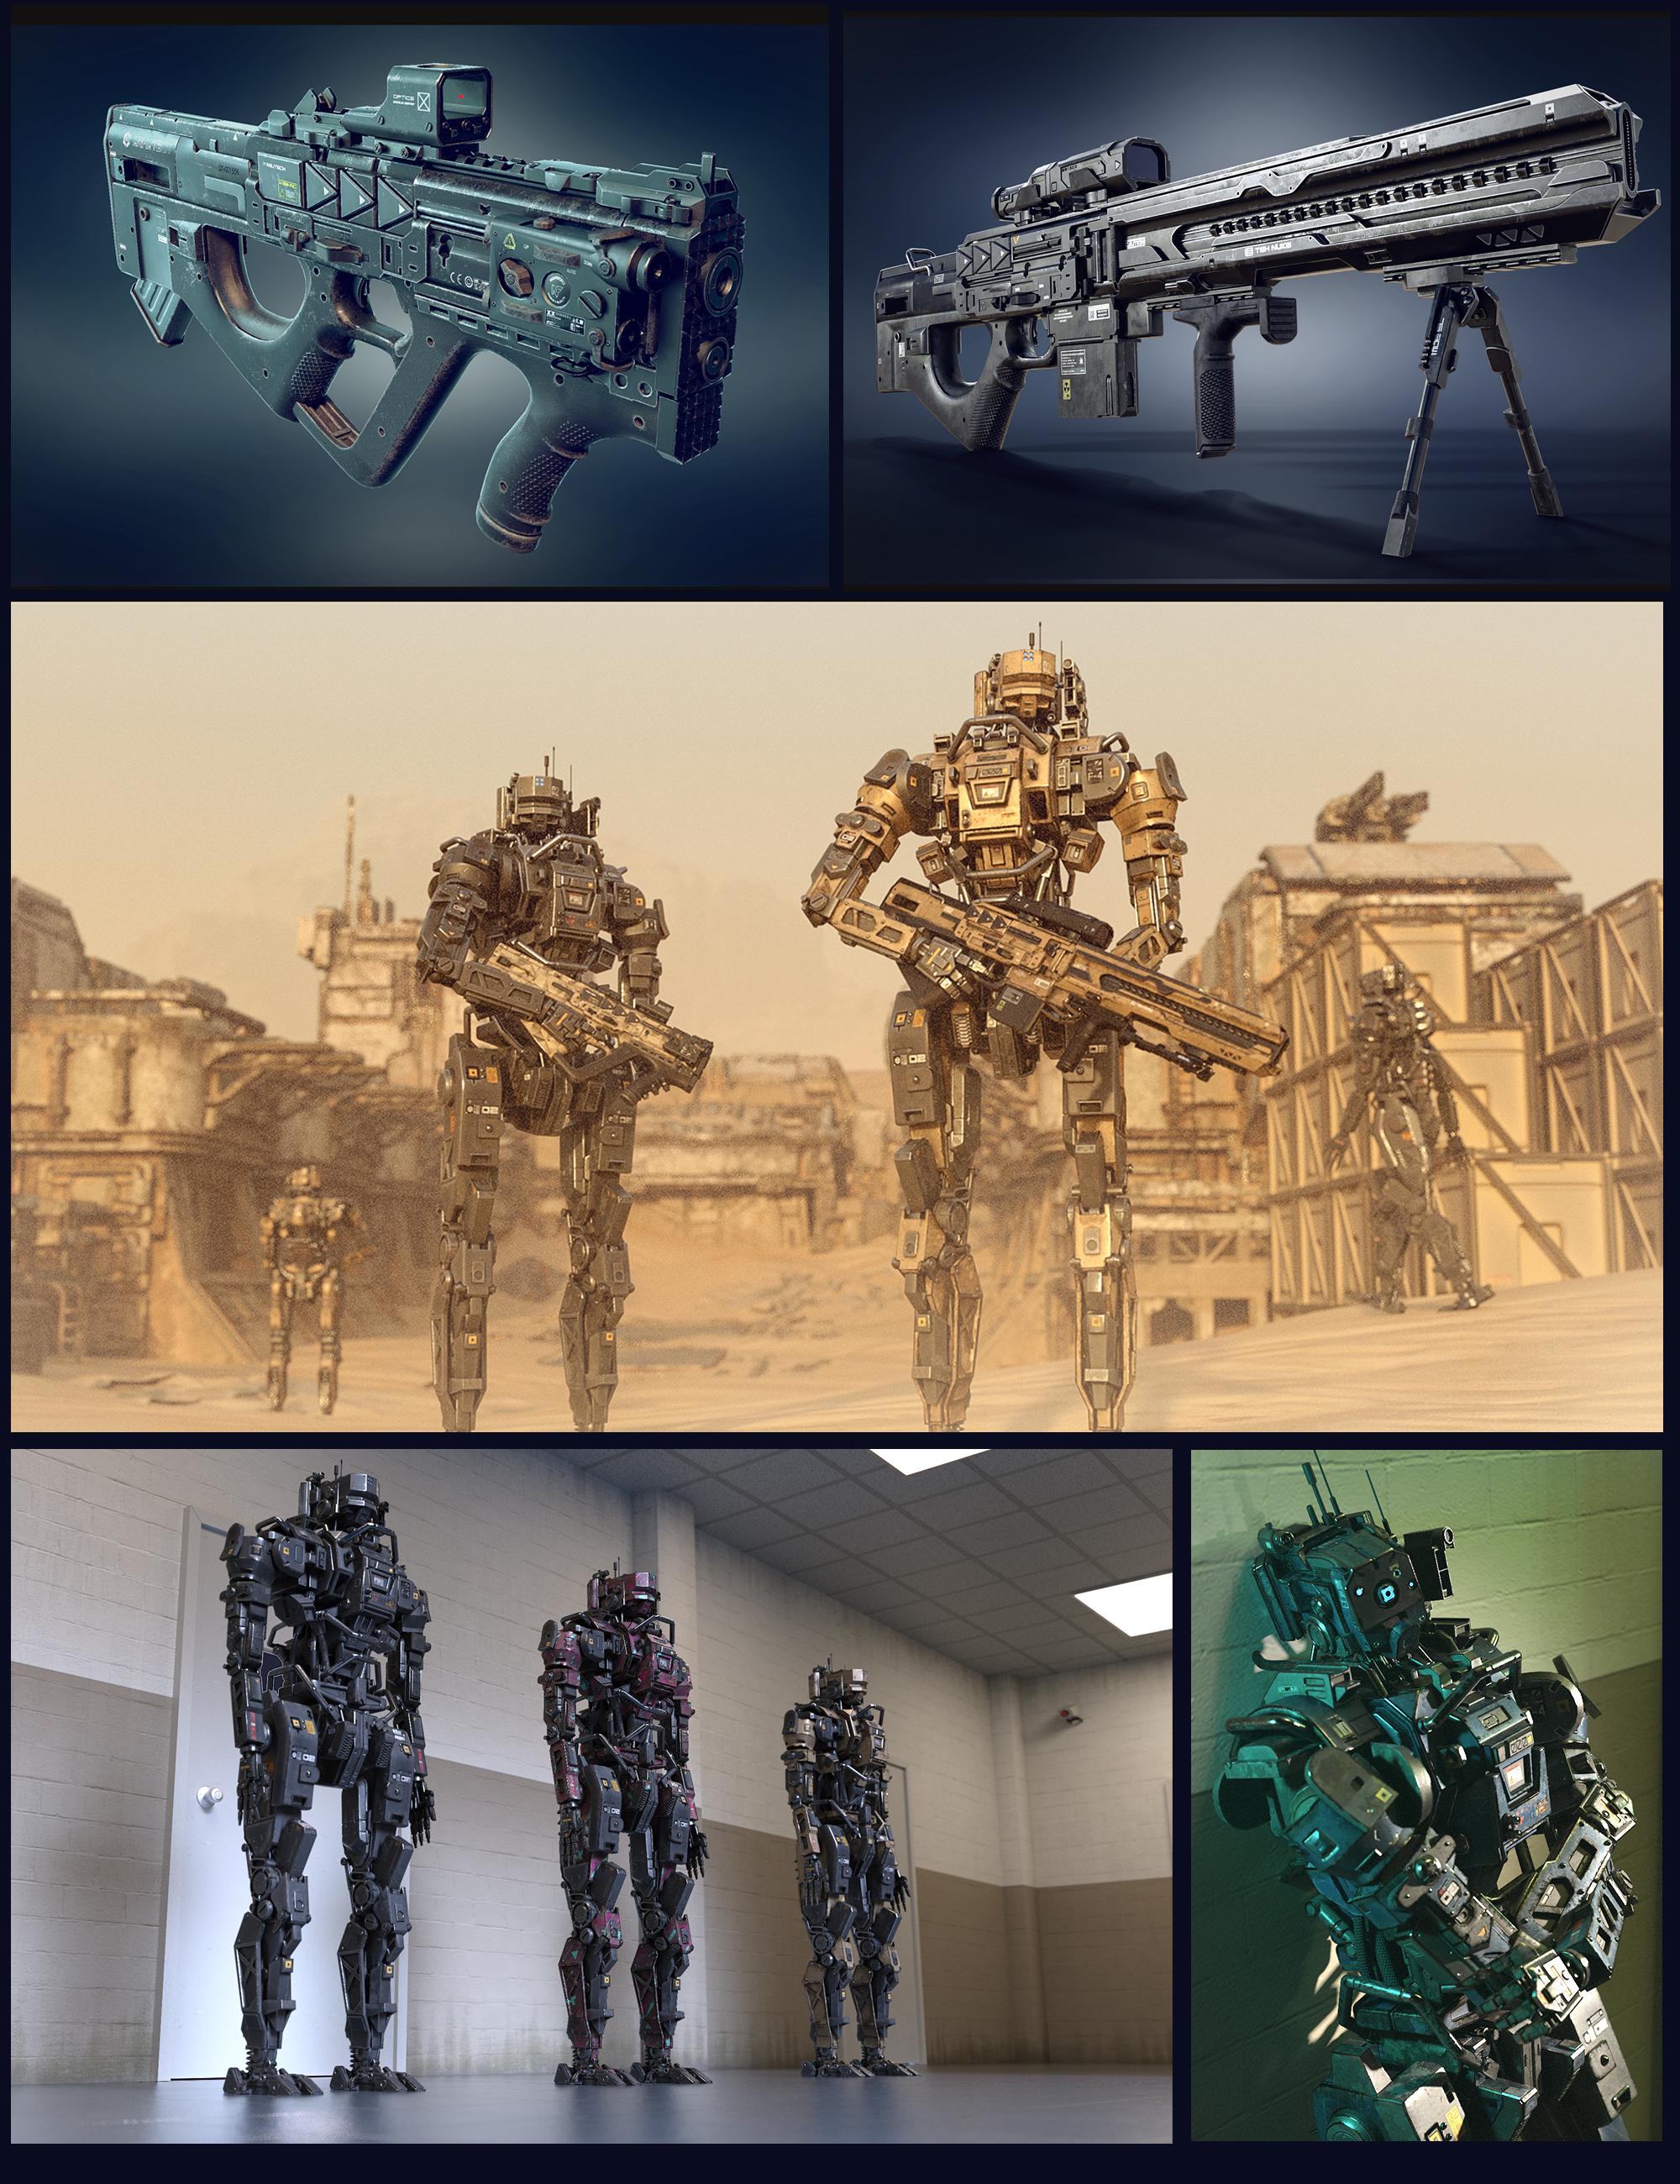 Cyberpunk MEC Droid and Weapons Bundle by: Polish, 3D Models by Daz 3D